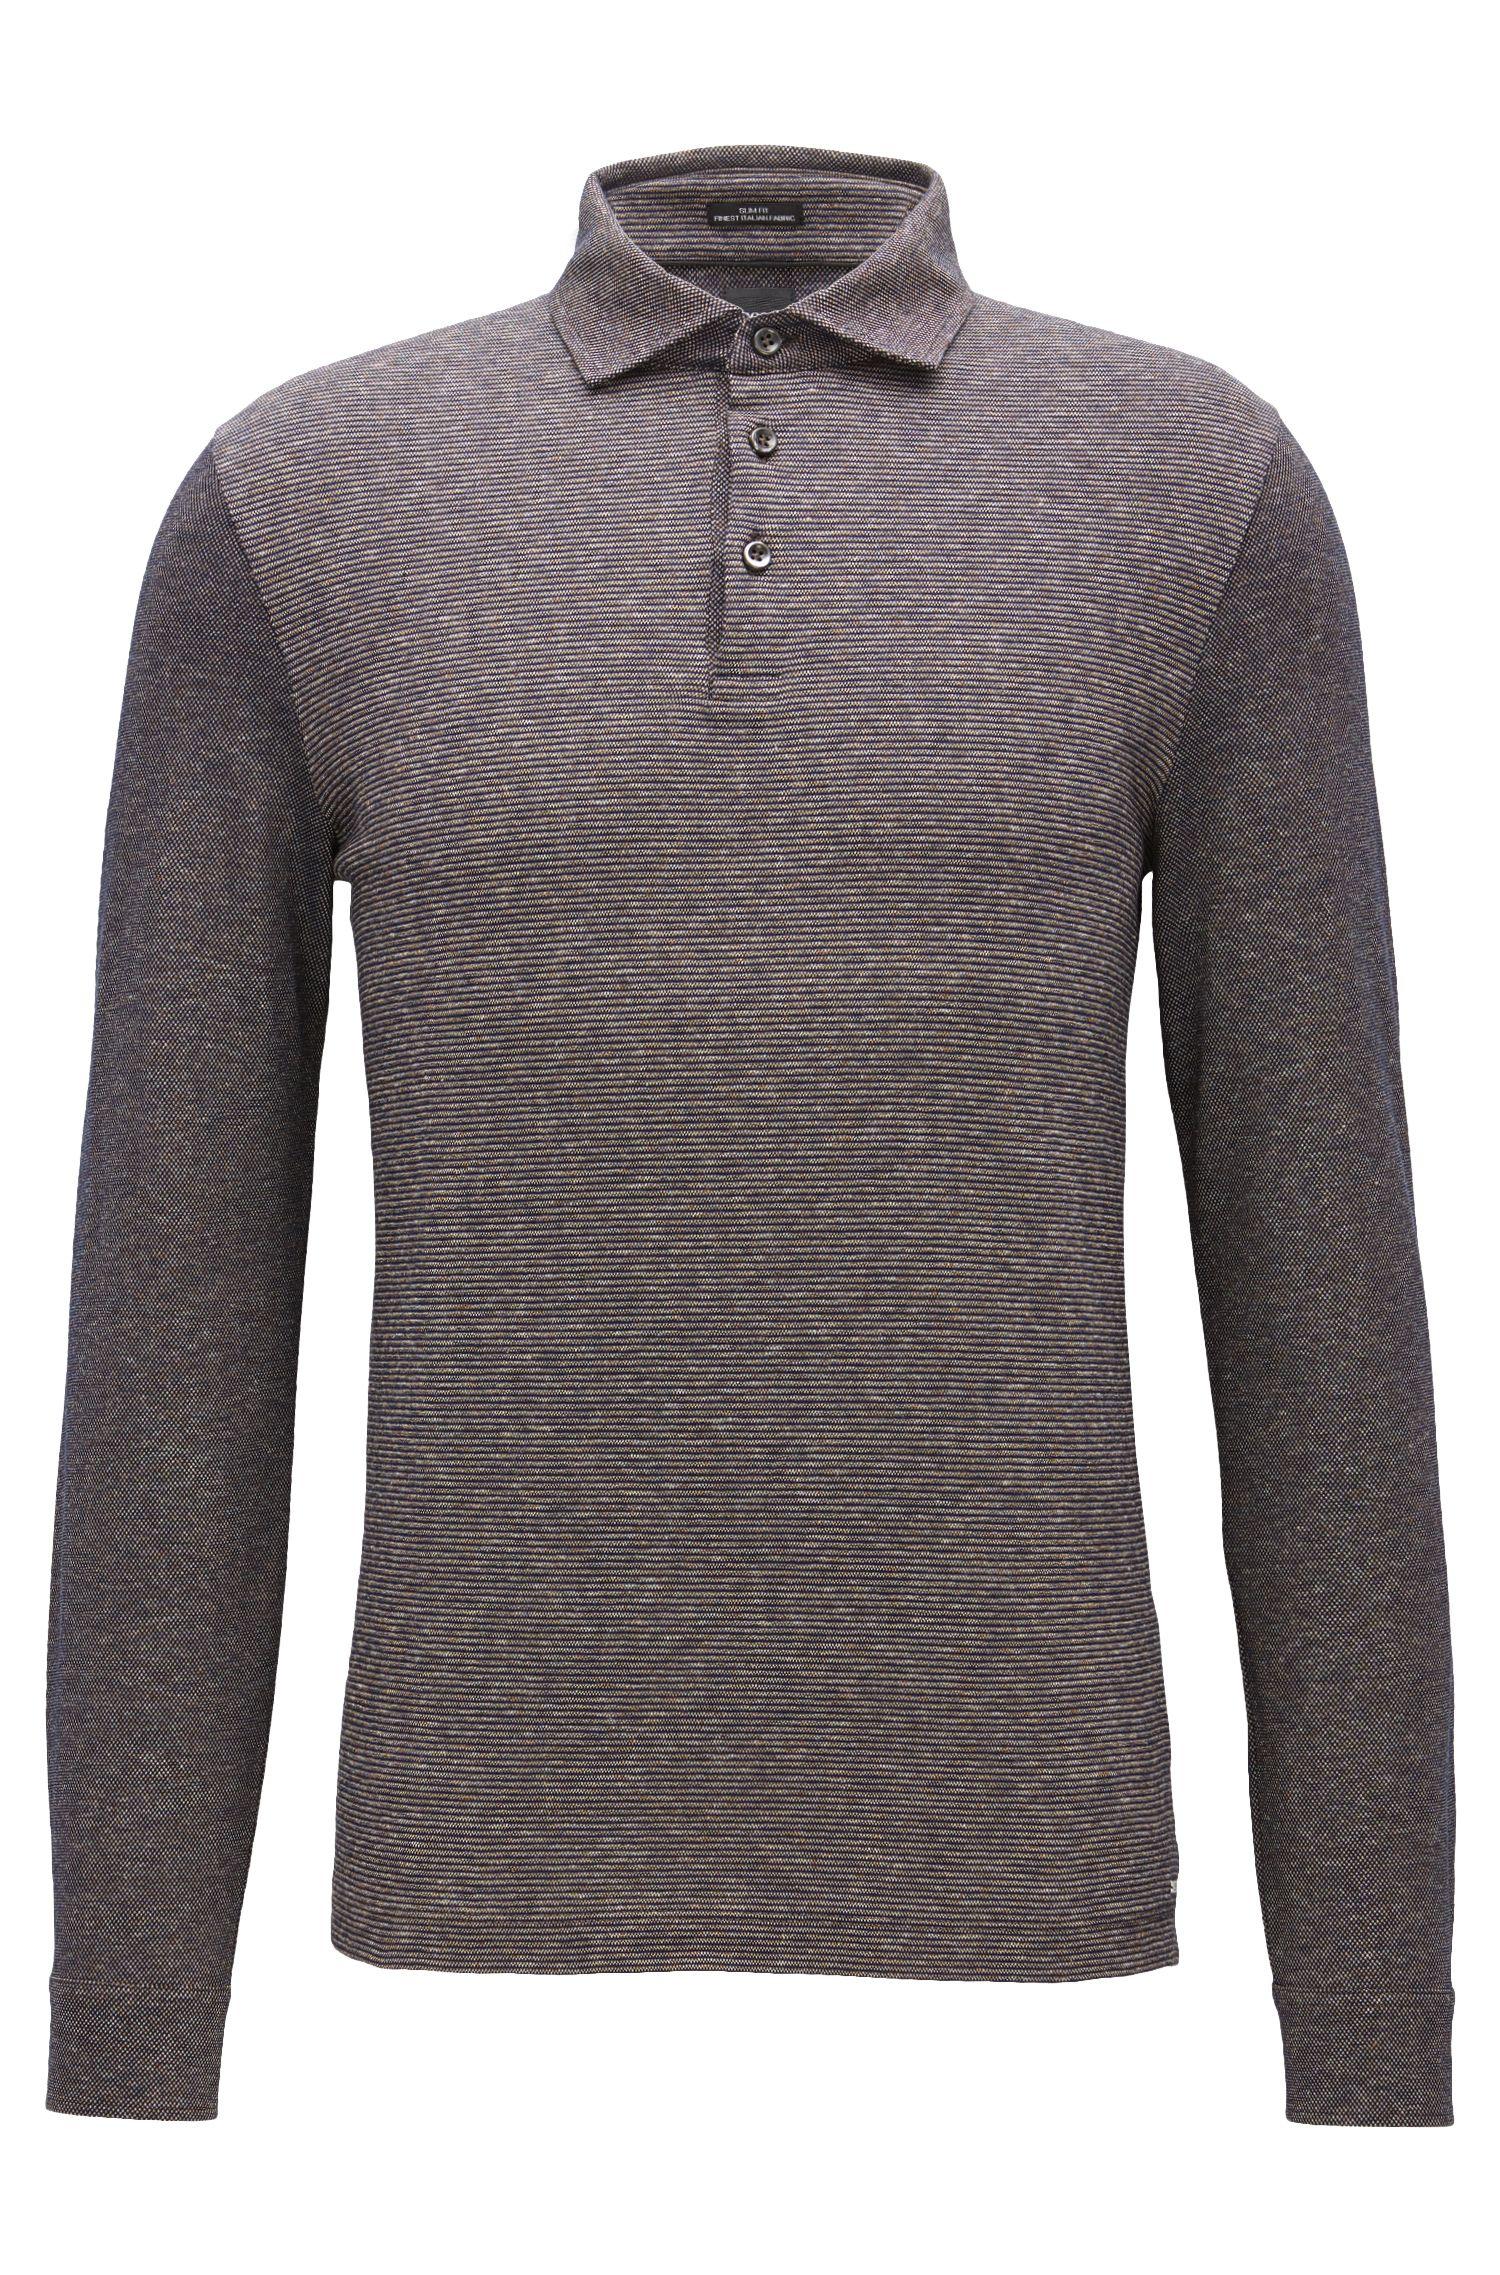 Slim-Fit Longsleeve Poloshirt aus Baumwolle mit gestreiftem Jacquard